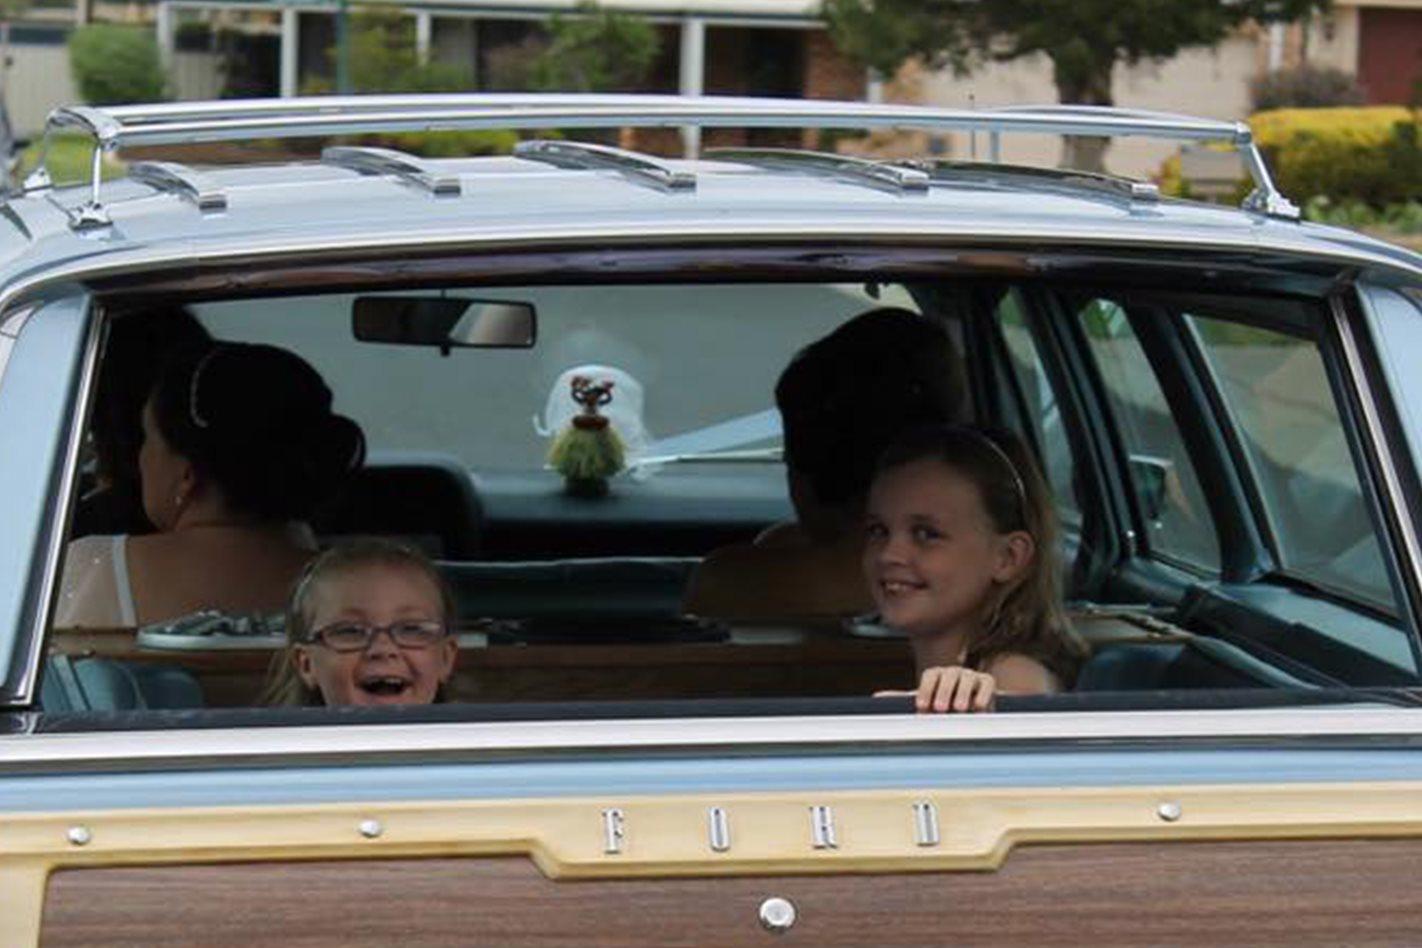 Daniel Chalker's wedding car